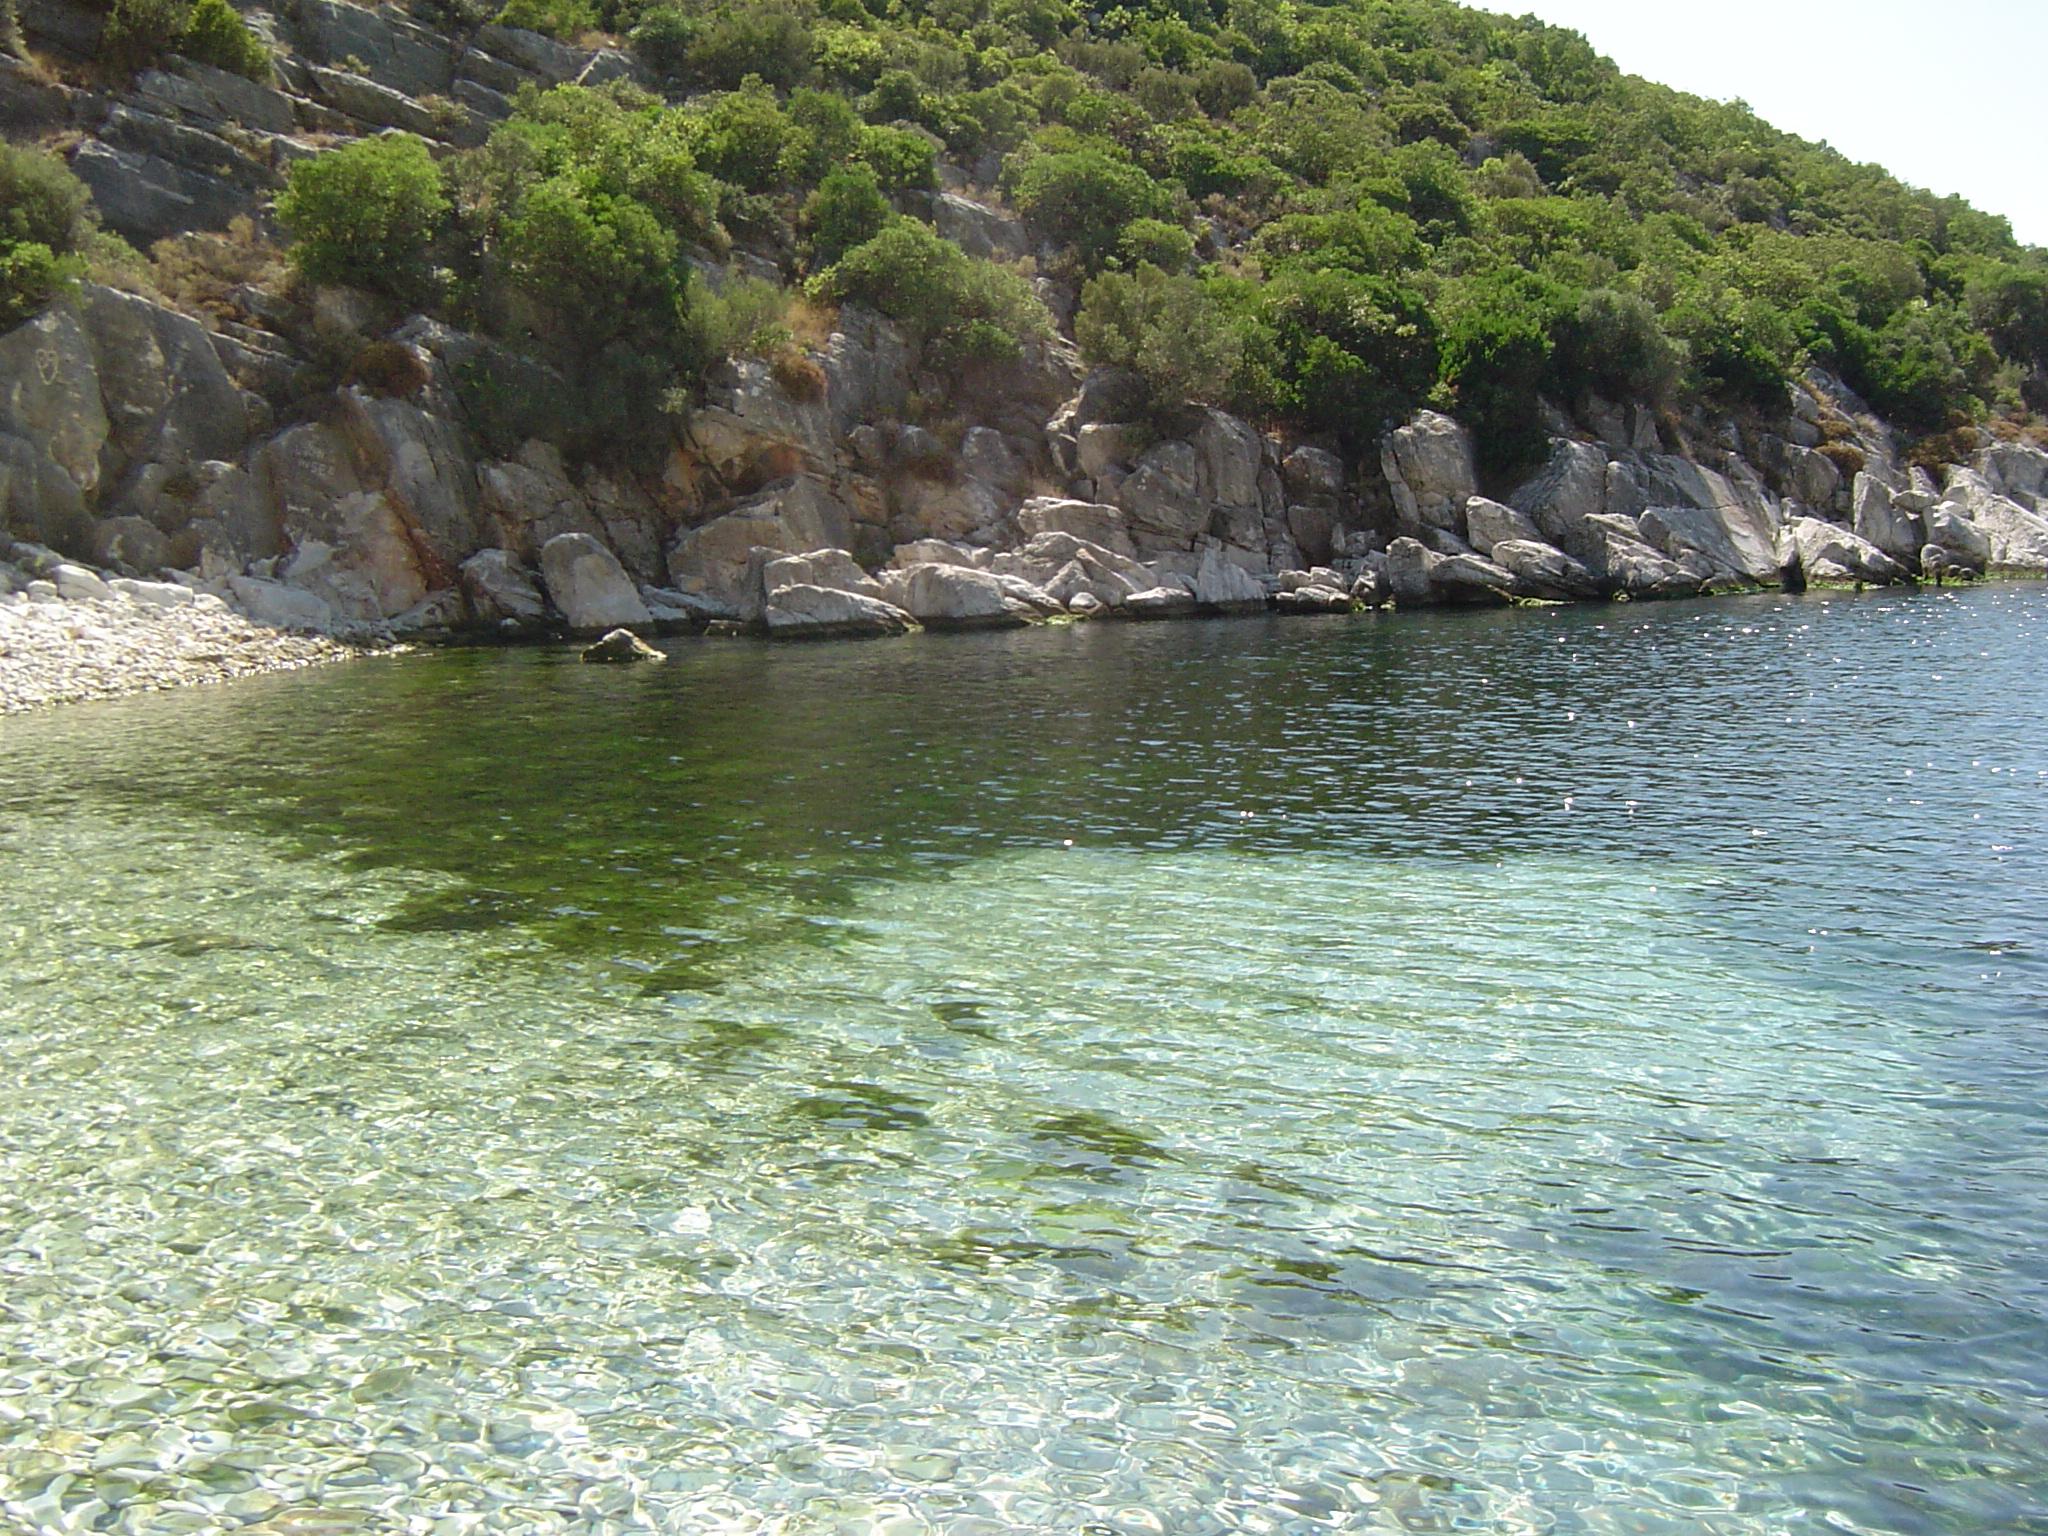 Турция, моря Турции, Мраморное море